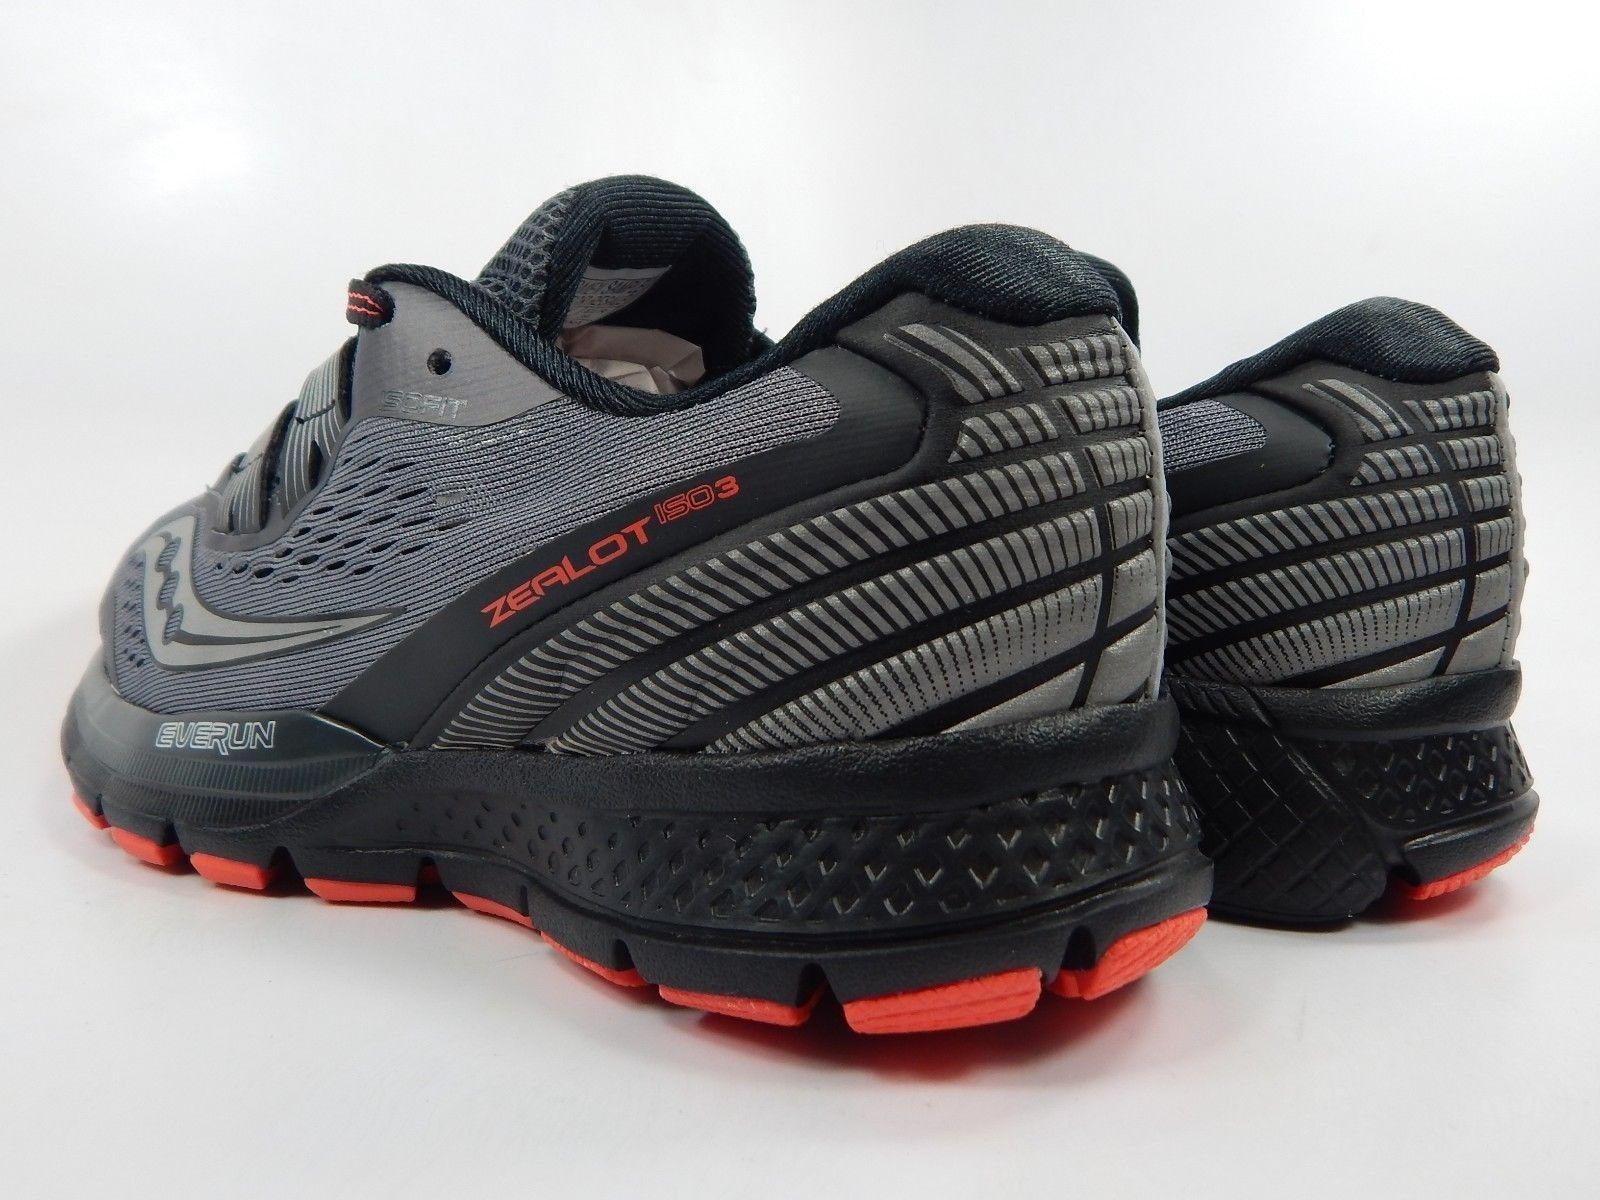 Saucony Zealot ISO 3 Women's Running Shoes Size US 8 M (B) EU 39 Grey S10399-1